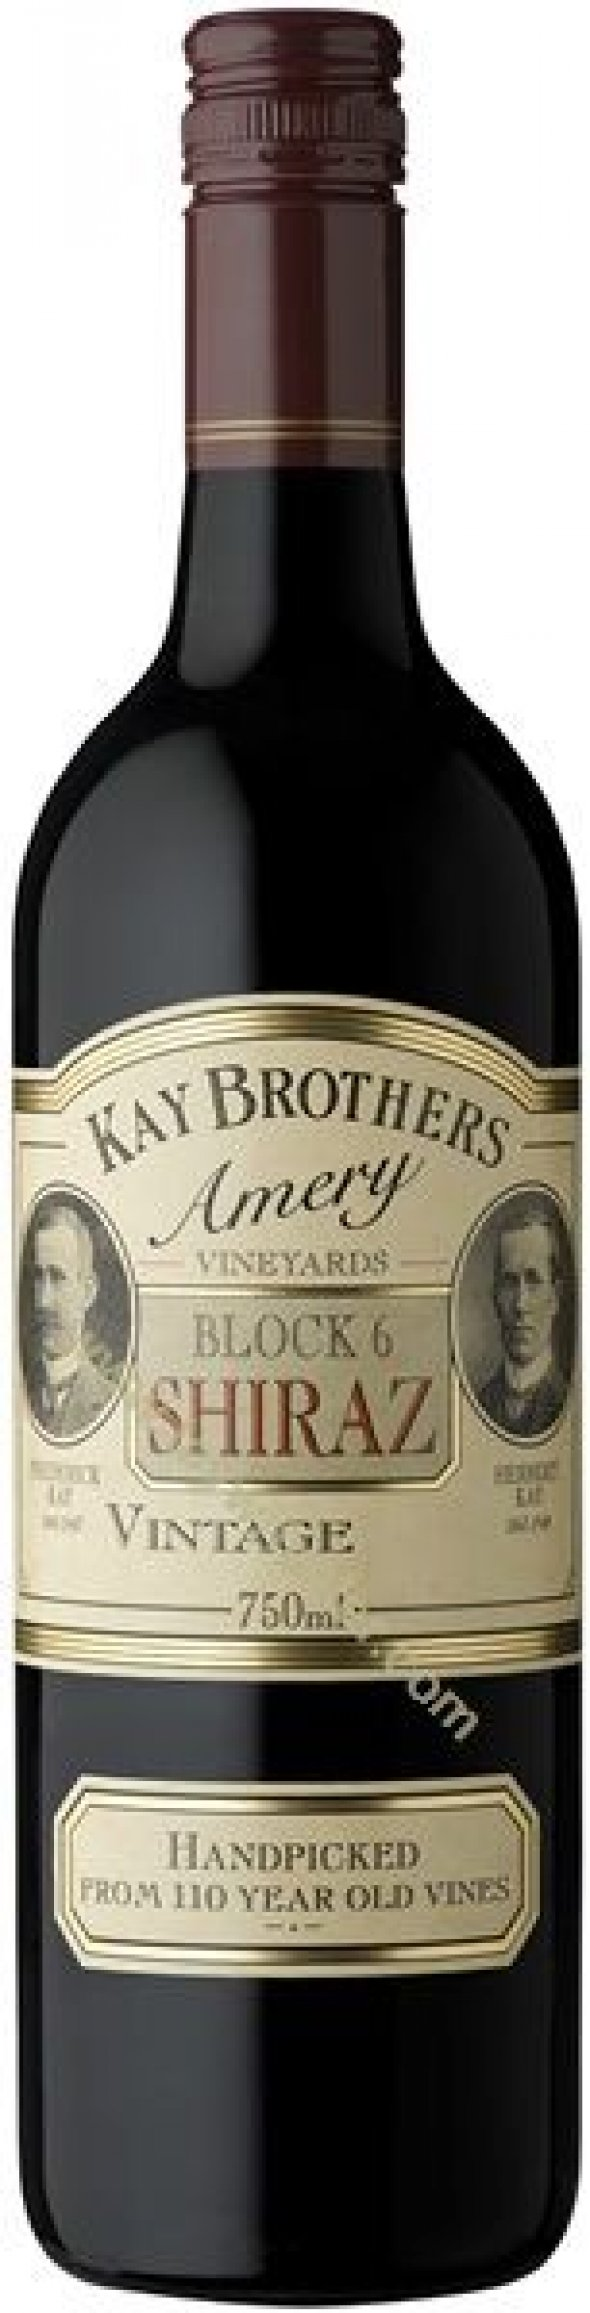 Kay Brothers, Block Six Shiraz, South Australia, McLaren Vale, Australia